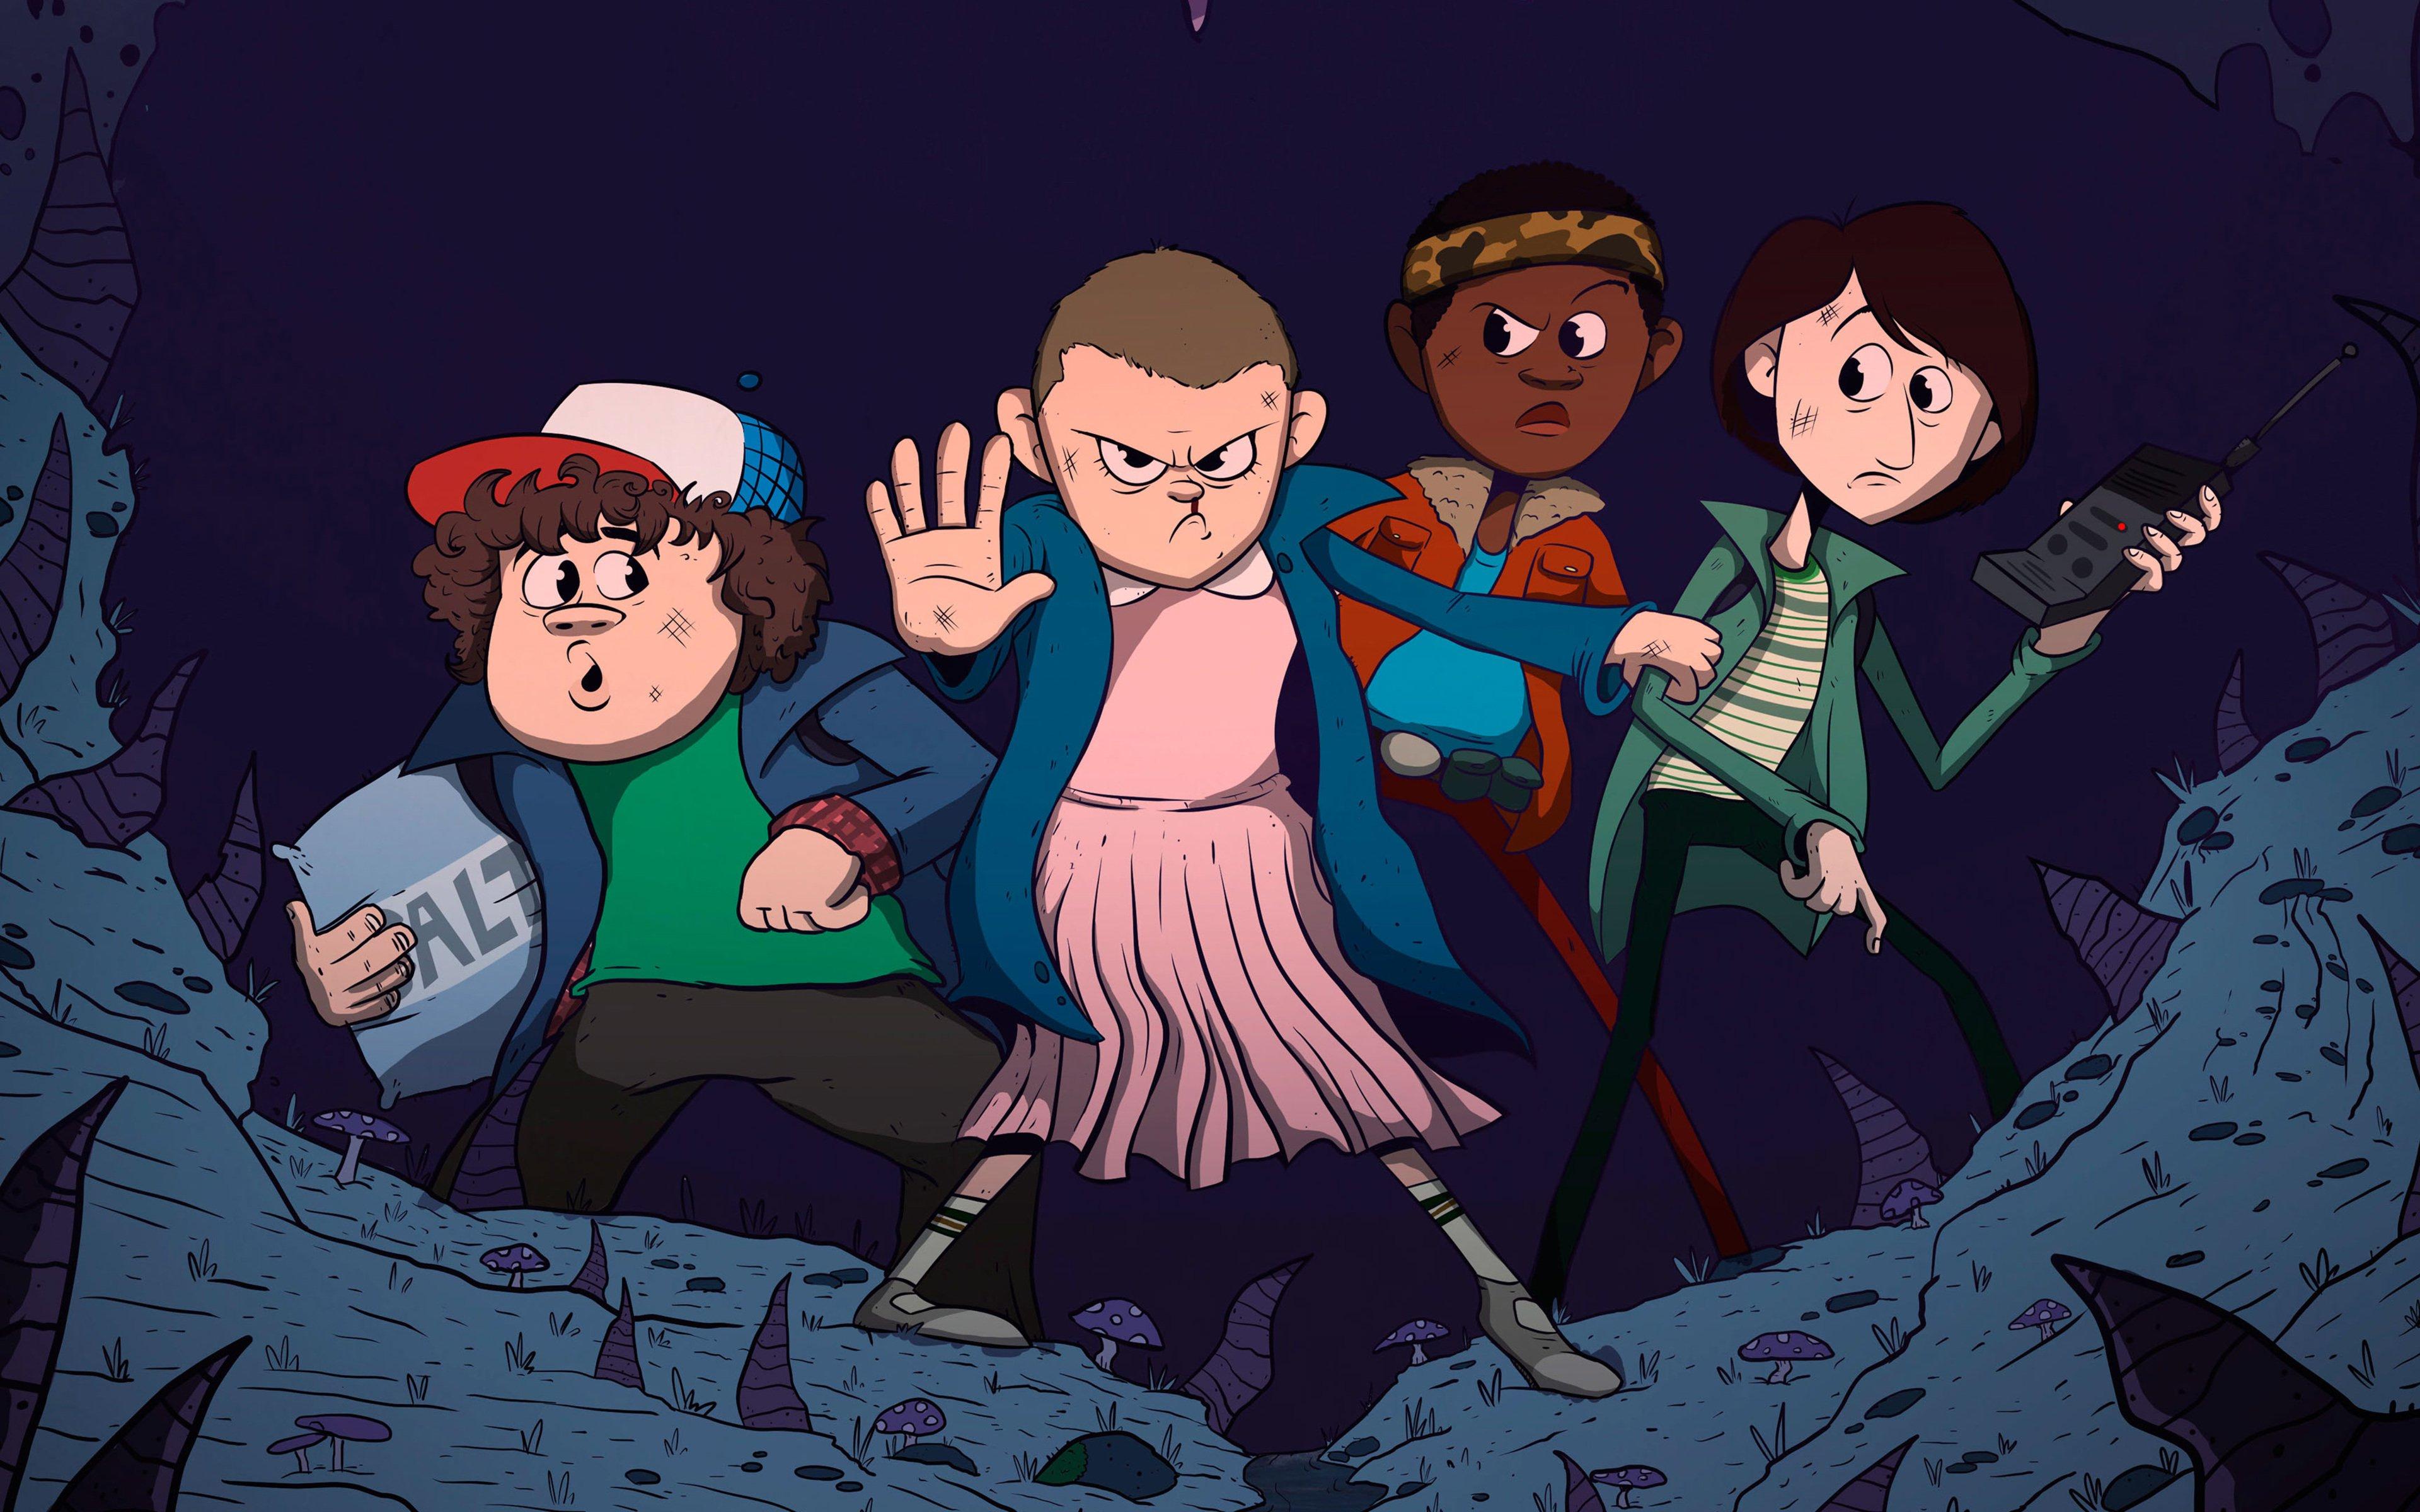 Fondos de pantalla Personajes de Stranger Things en caricatura